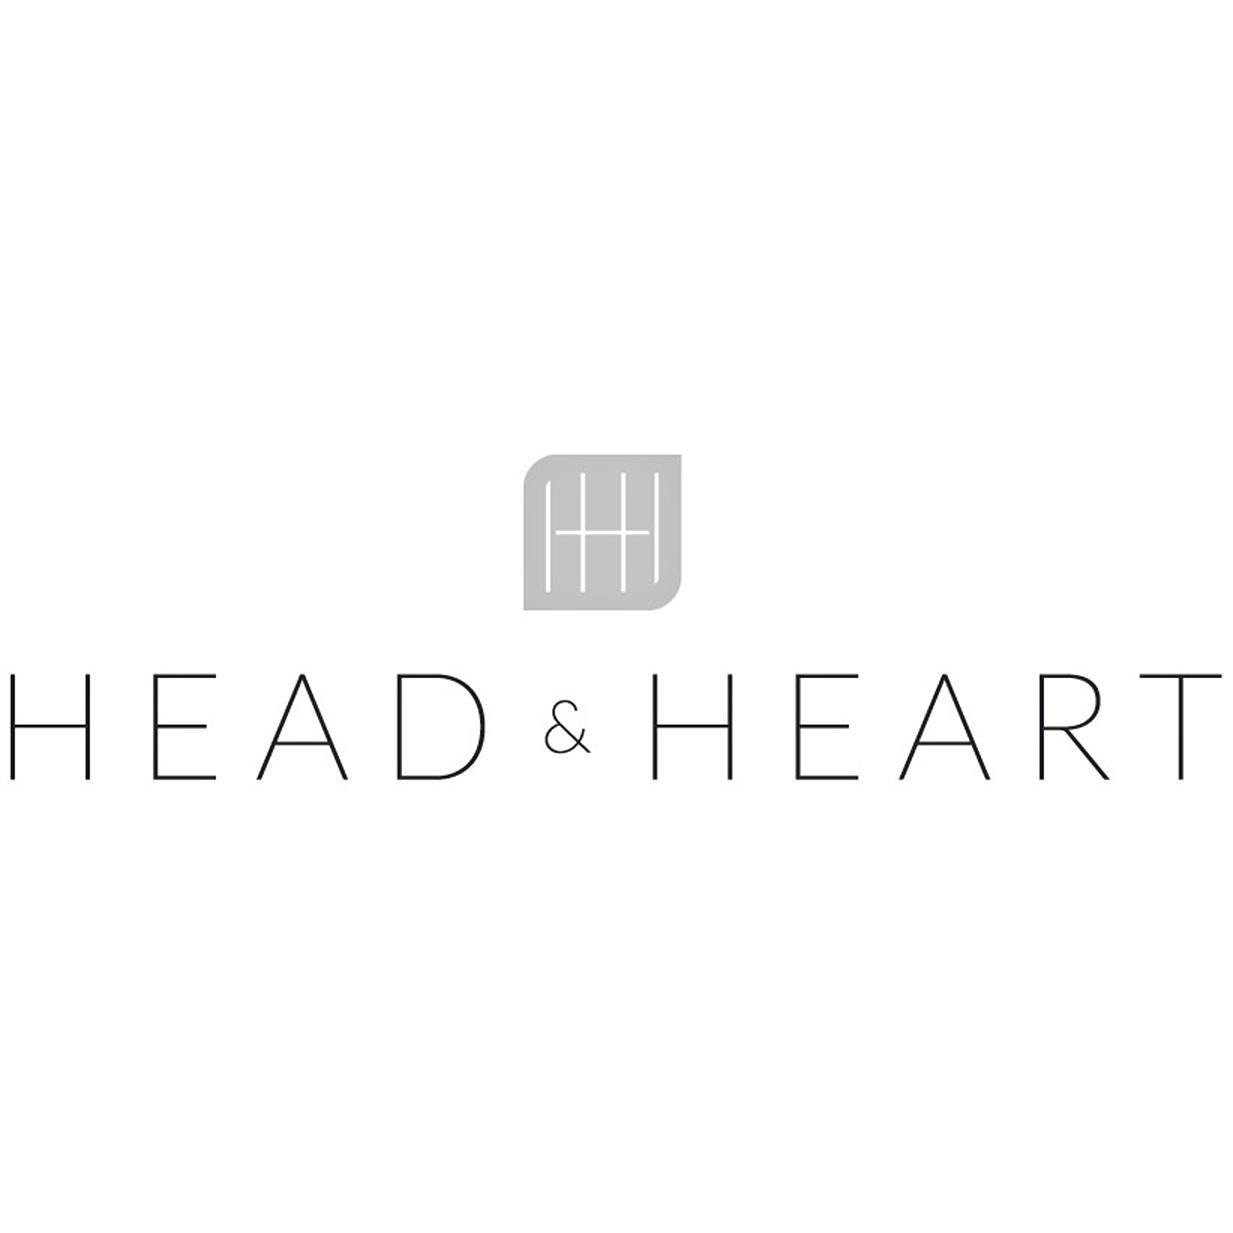 Head & Heart Photography